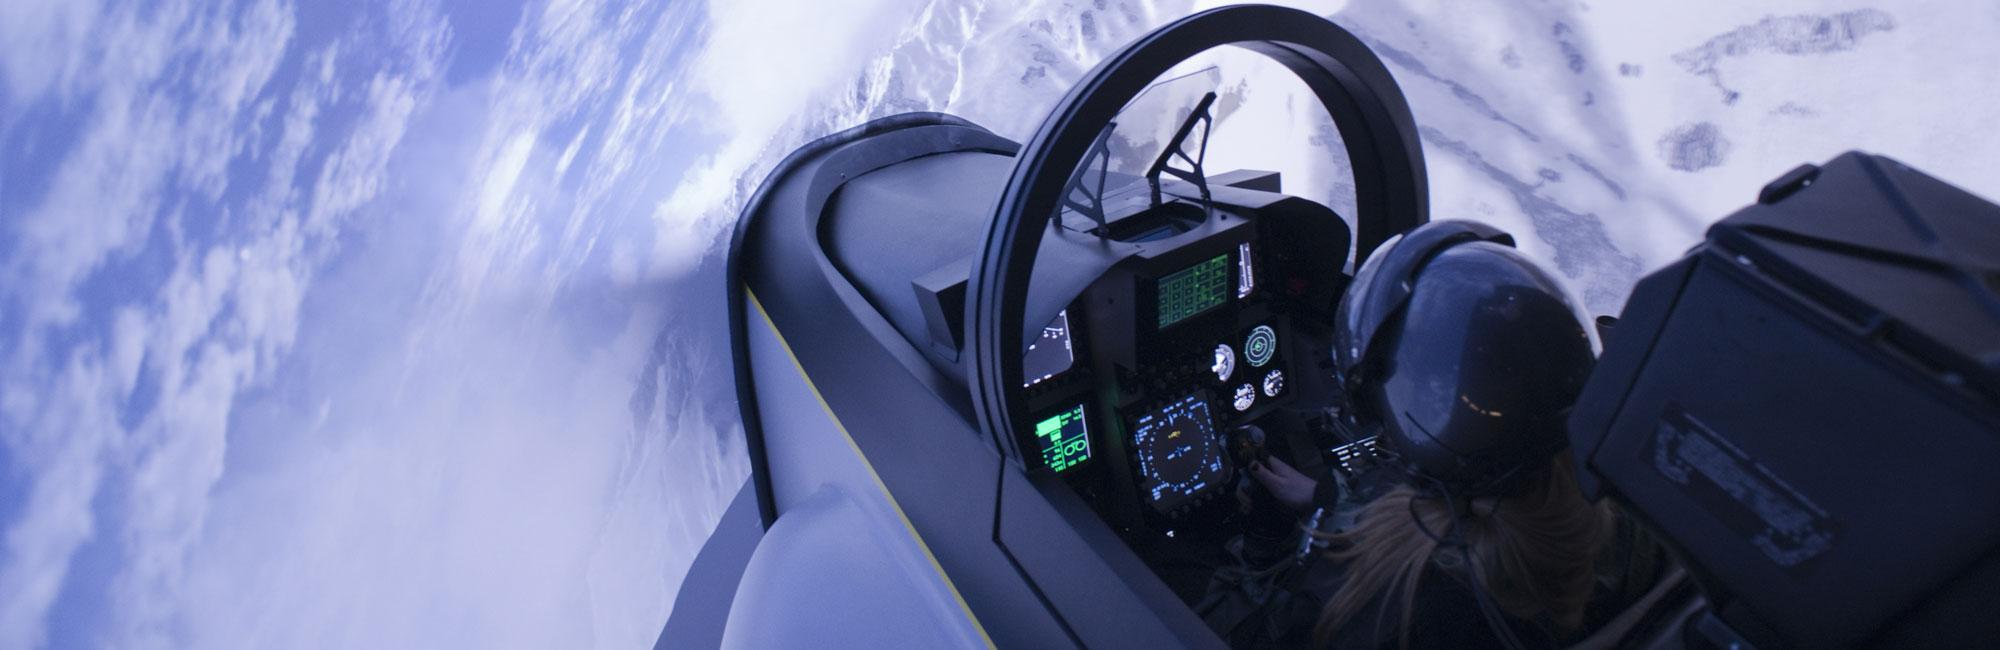 Simulation Avion de Chasse F18